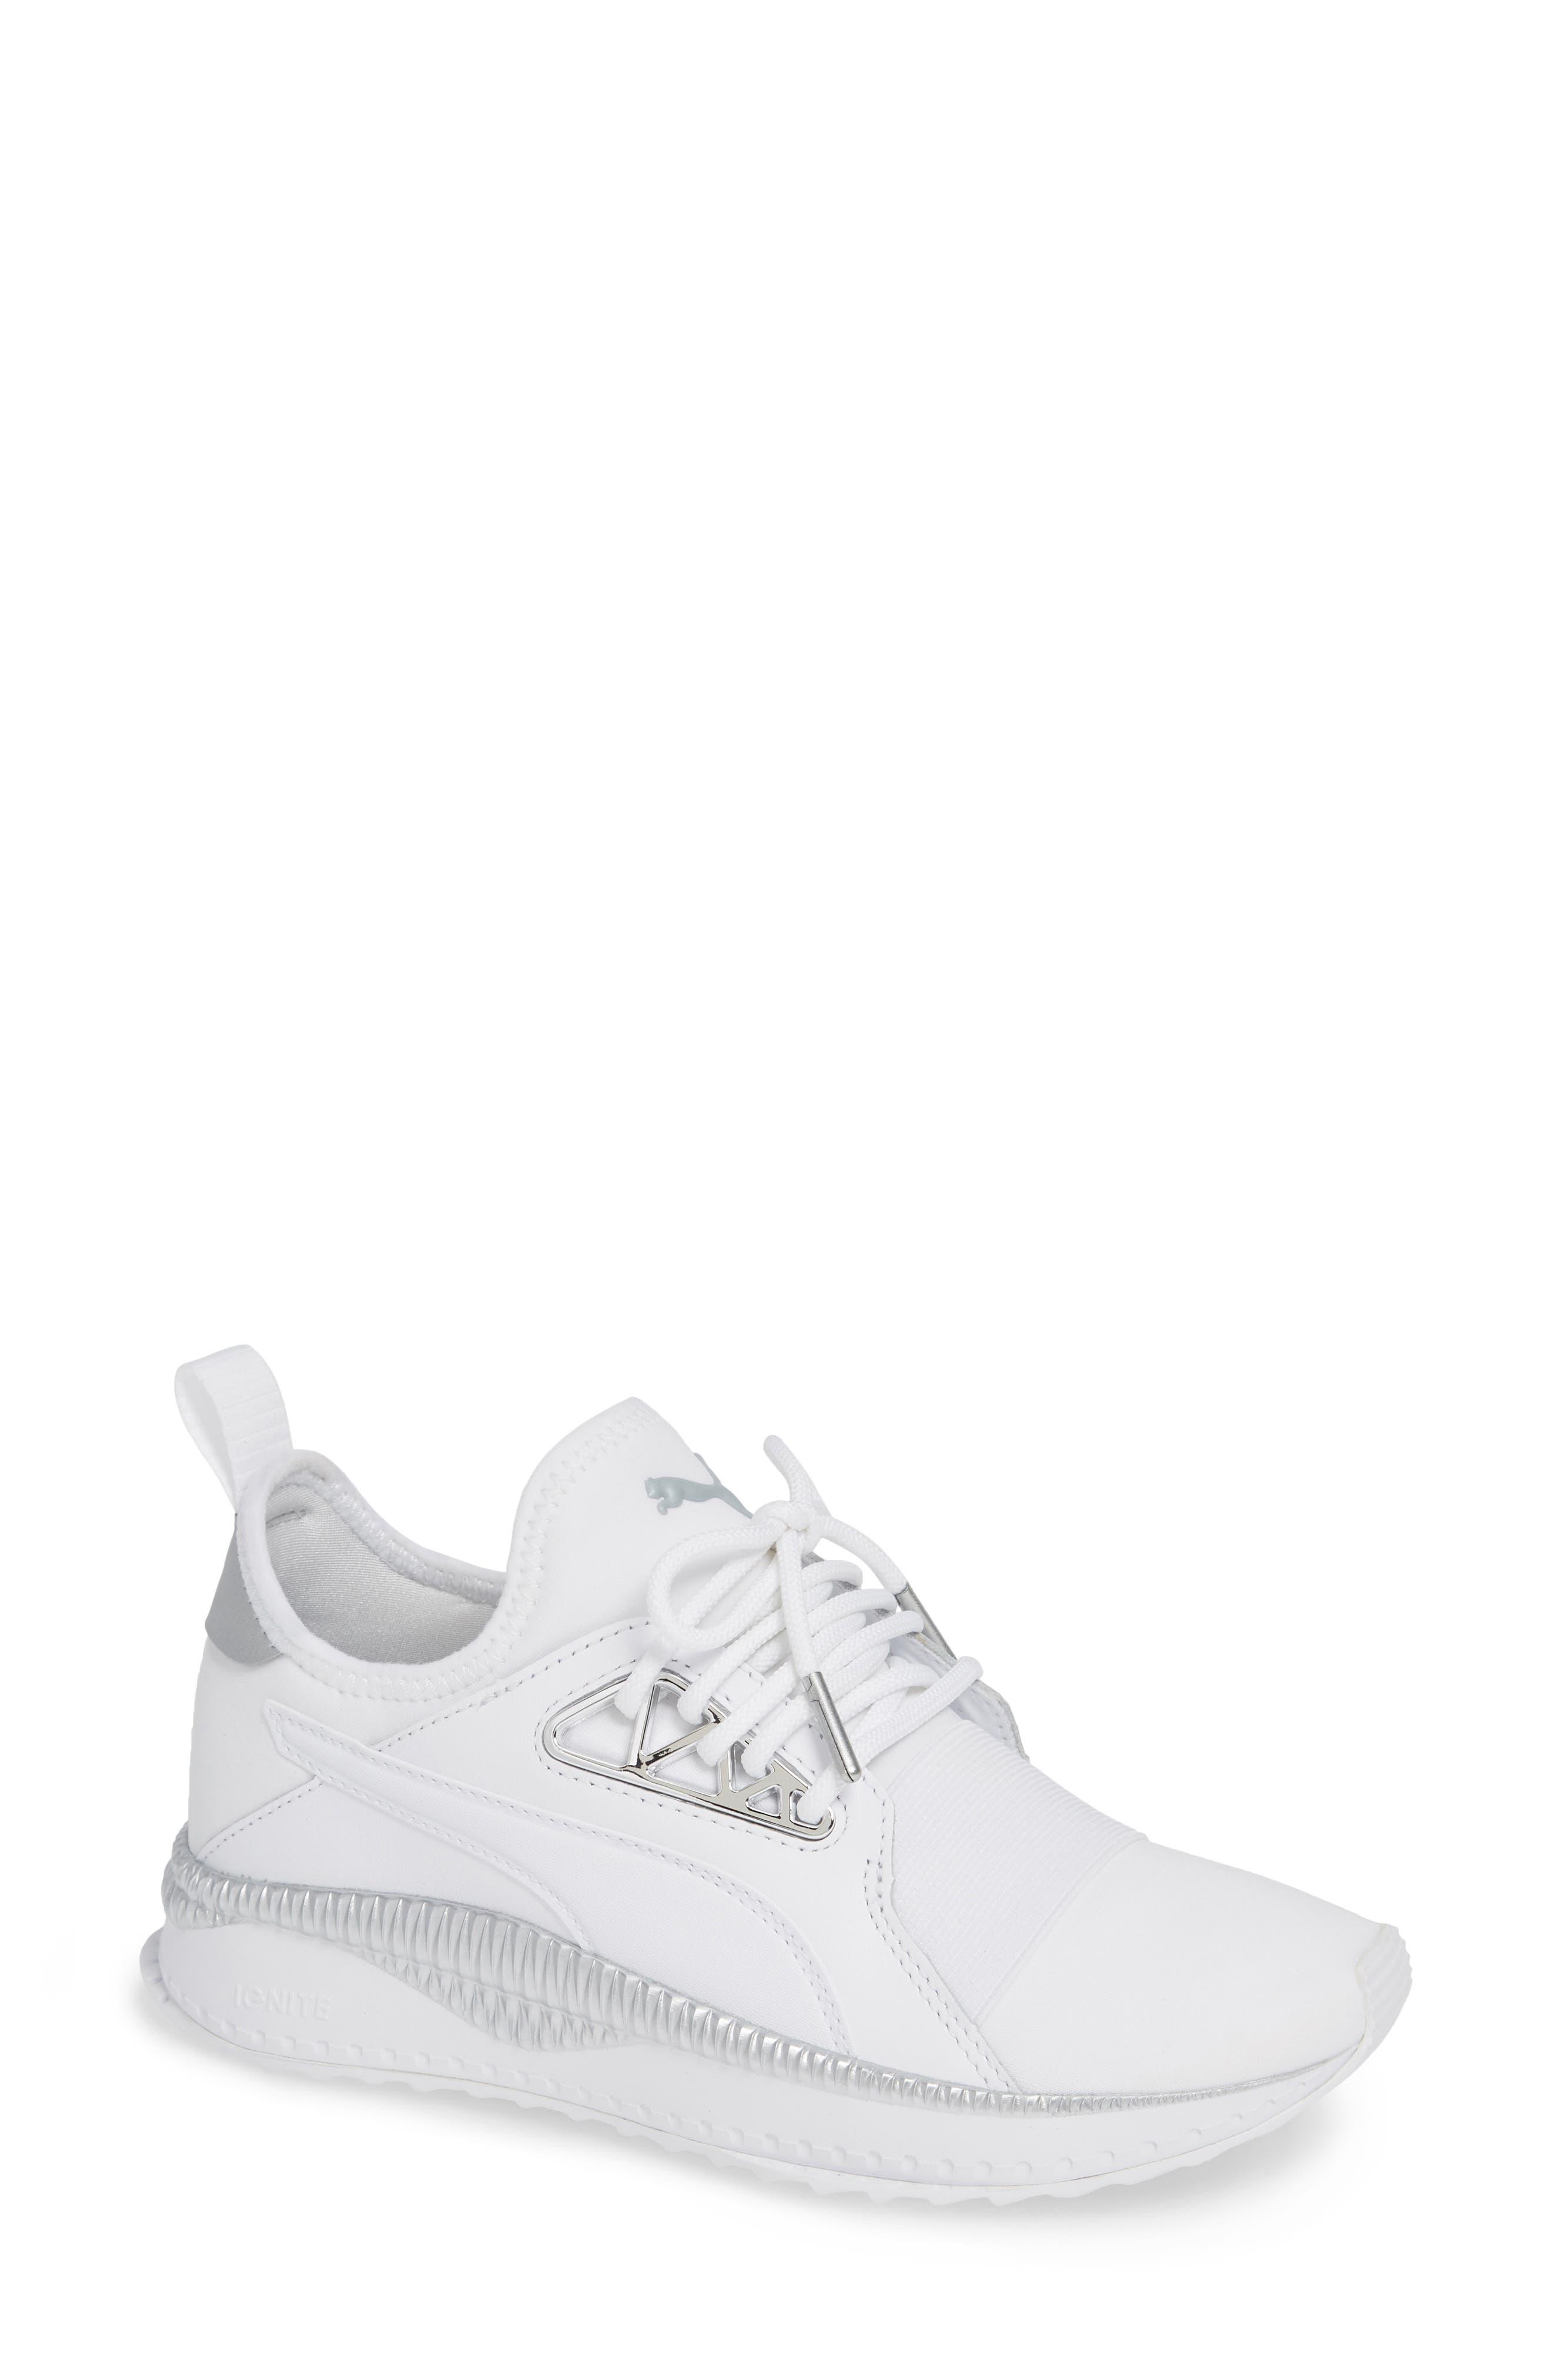 TSUGI Apex Jewel Sneaker,                             Main thumbnail 1, color,                             PUMA WHITE/ PUMA WHITE